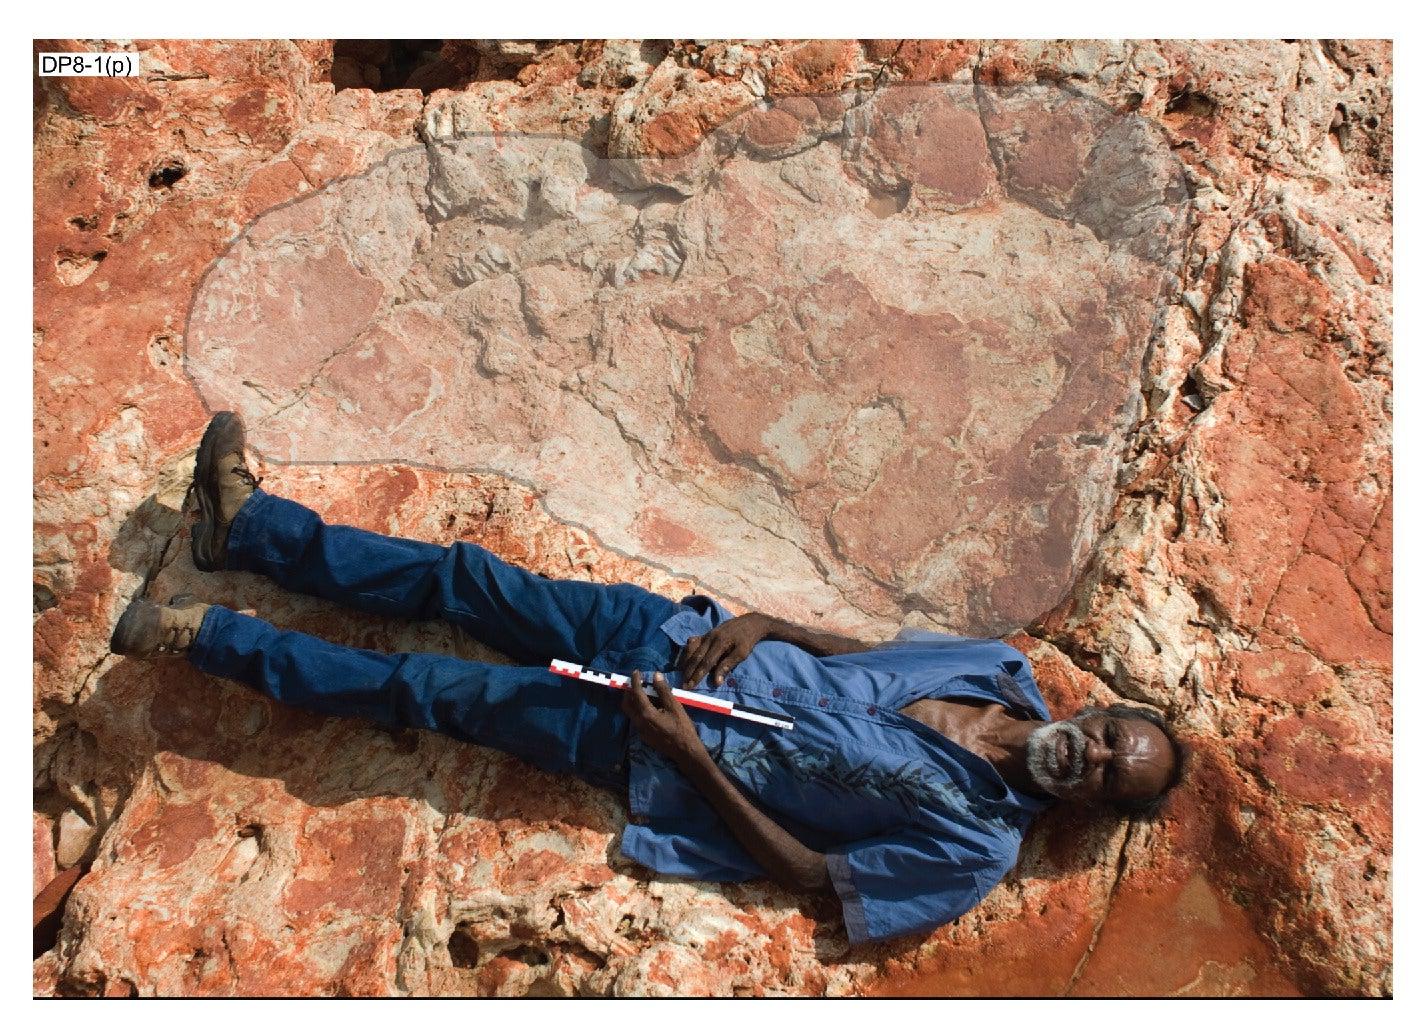 Sauroprint giant footprint